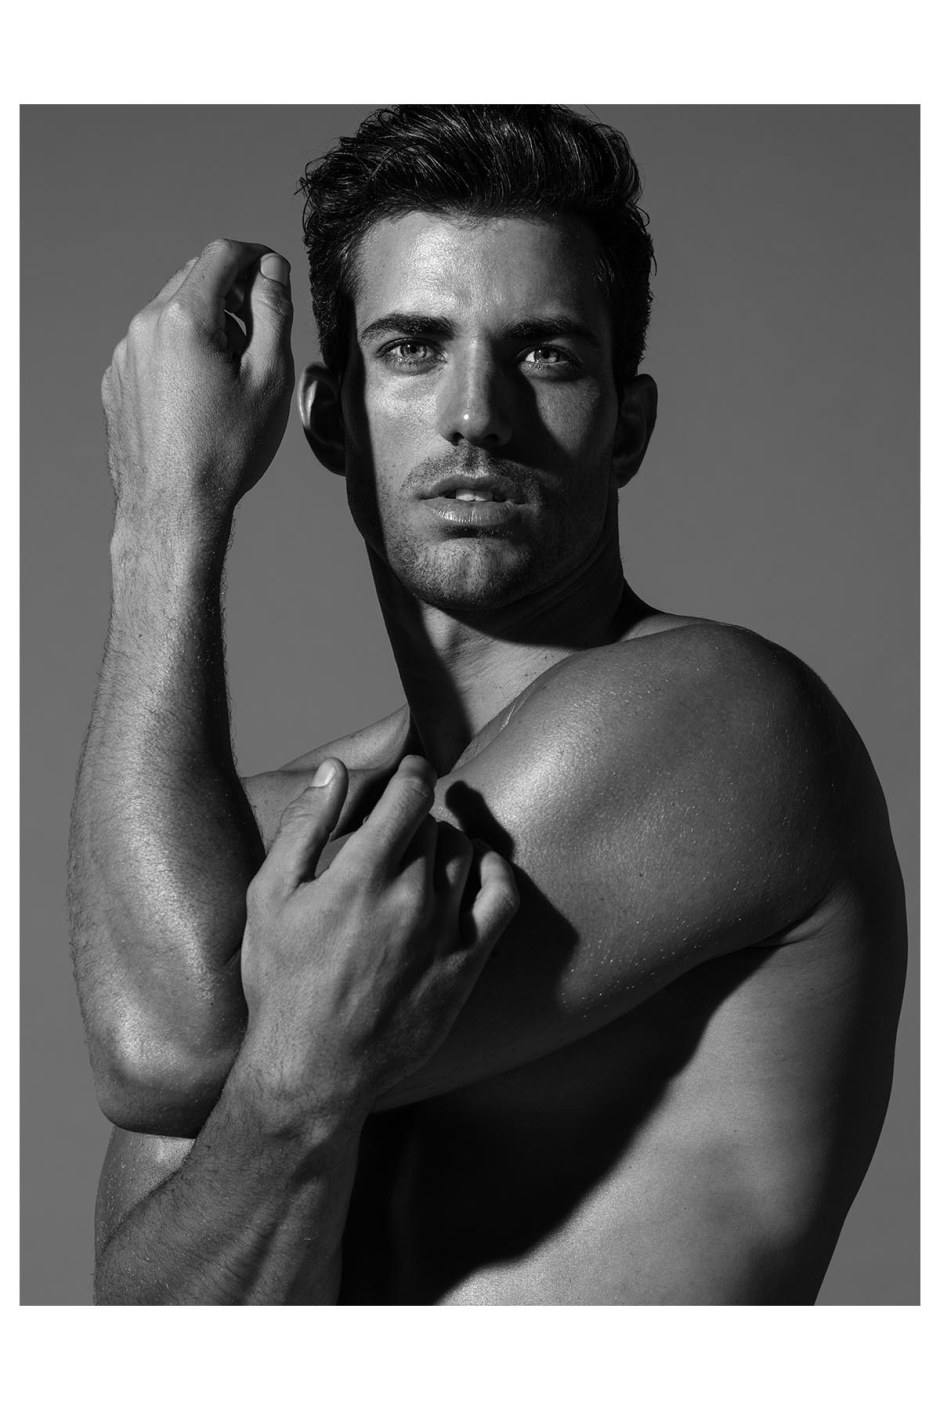 Hugo Tenorio by Wong Sim for Brazilian Male Model_003